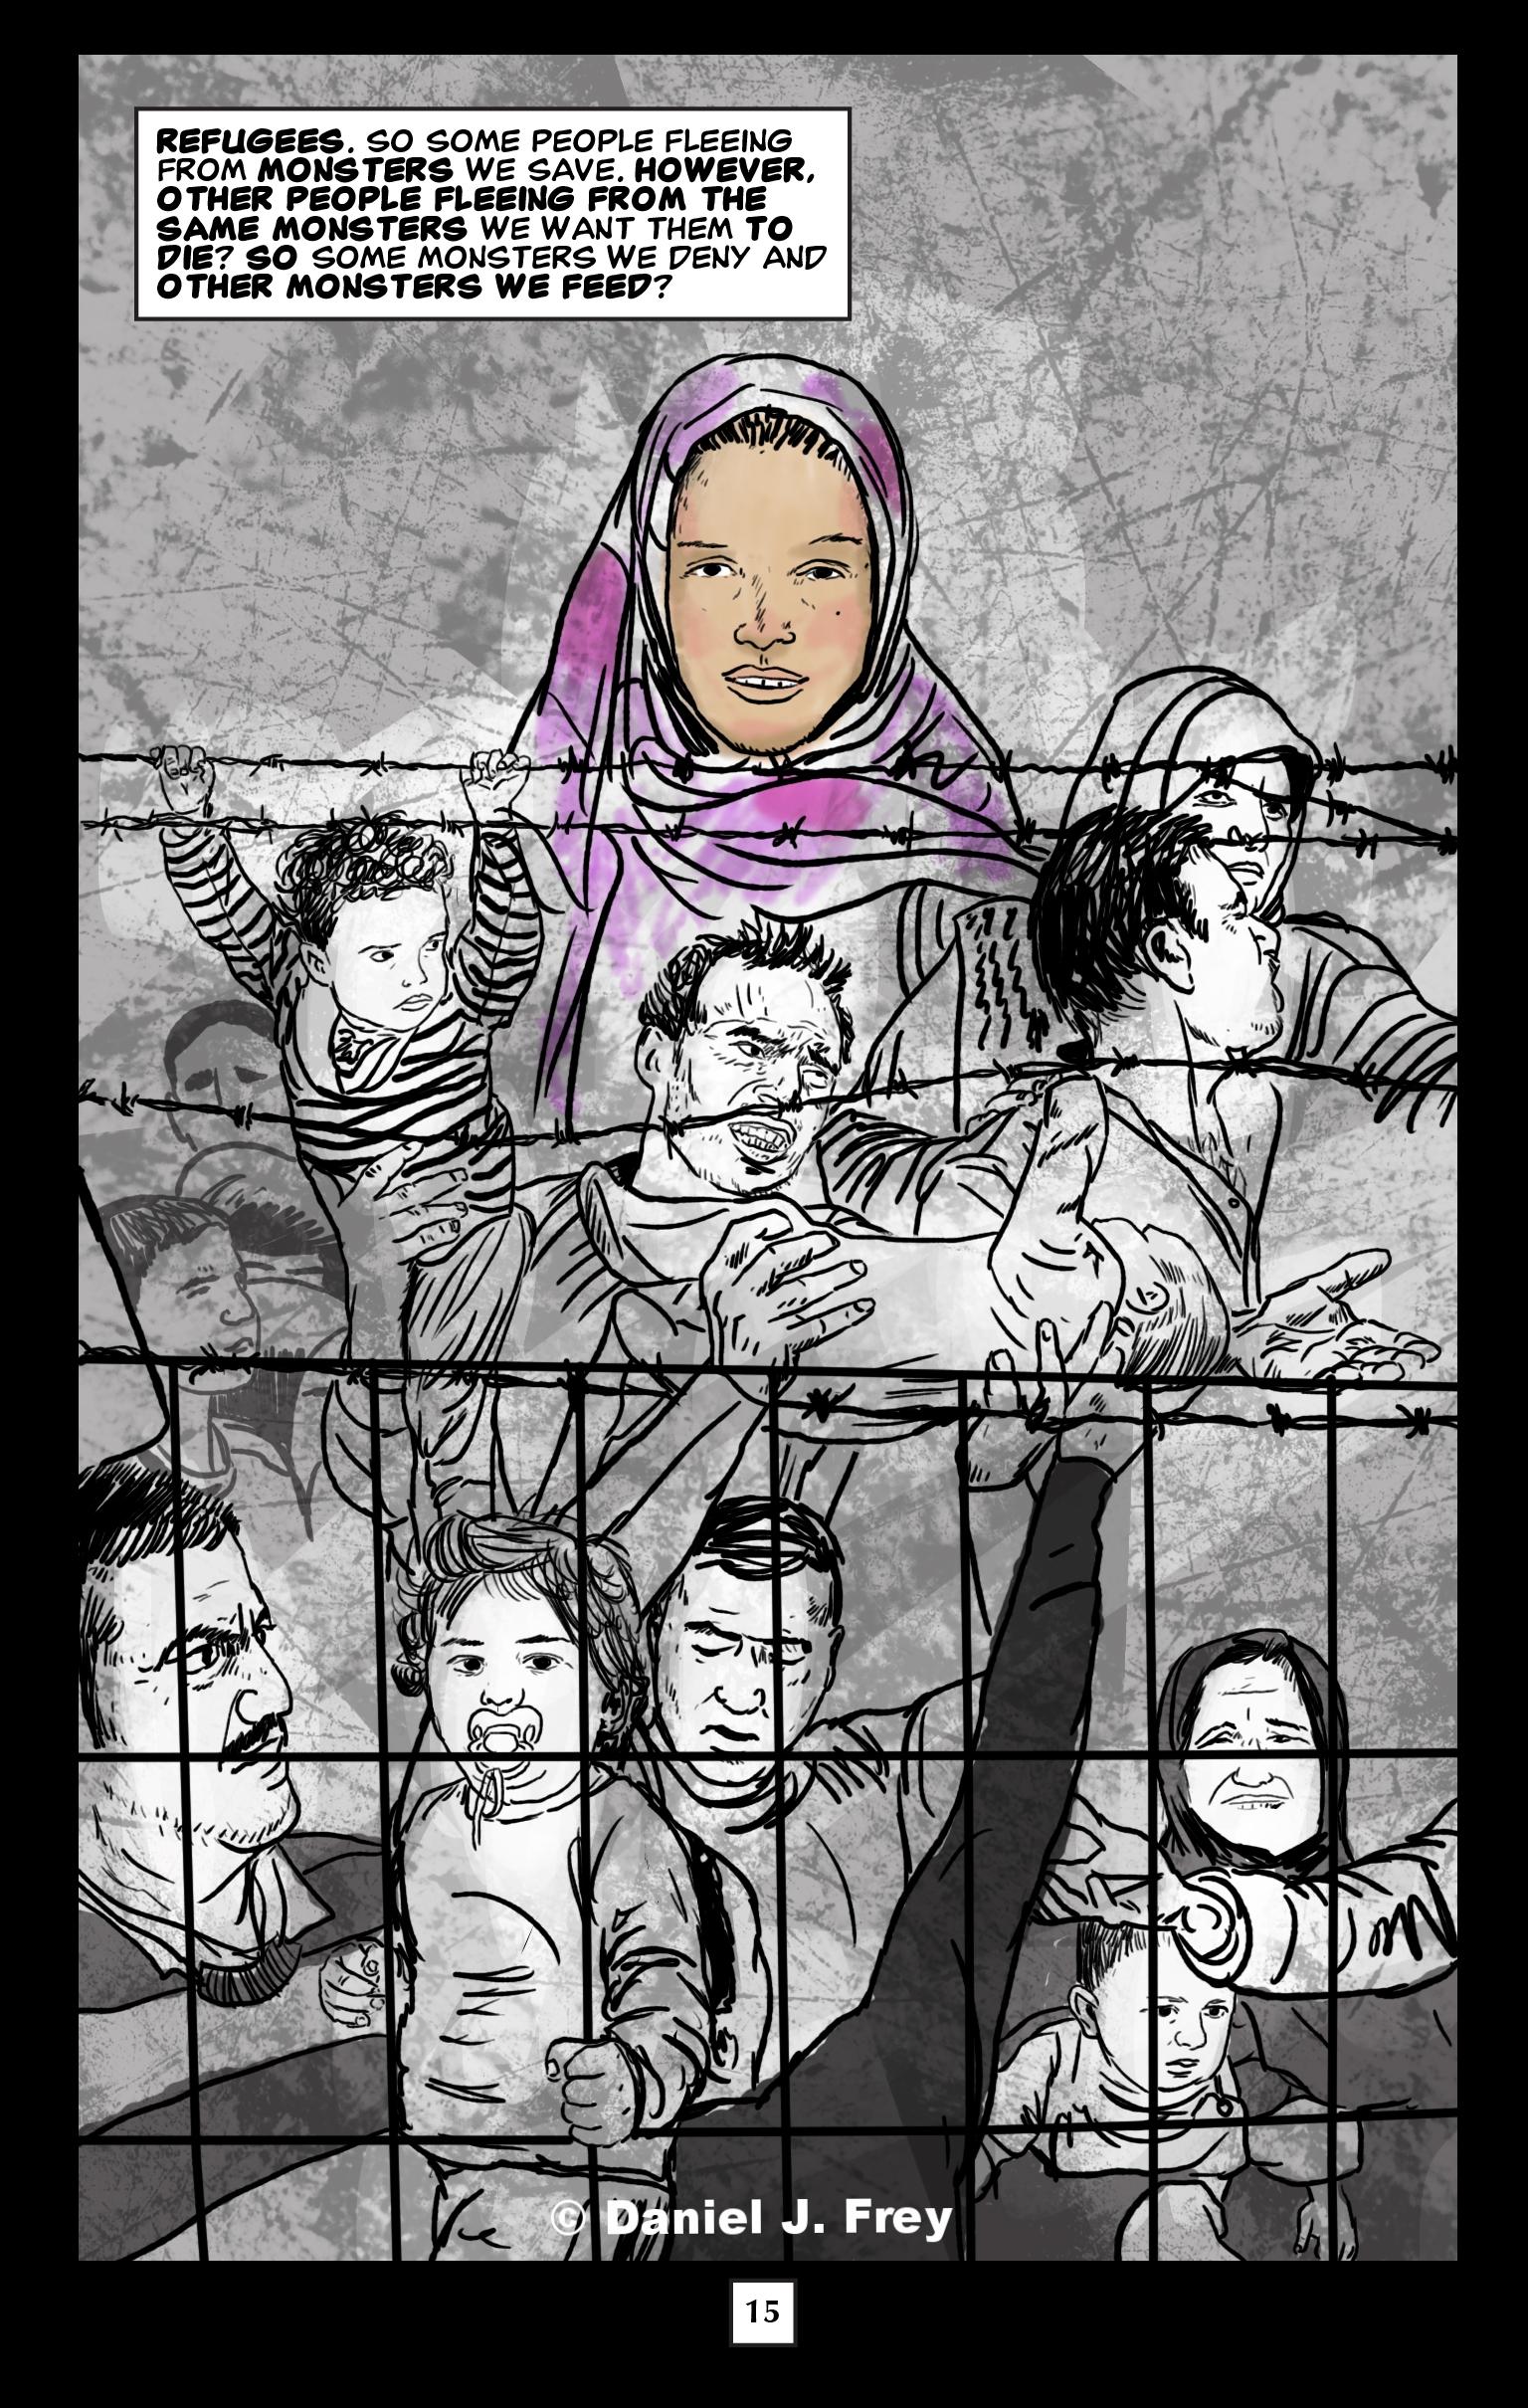 refugees, Daniel J Frey, Forces Film